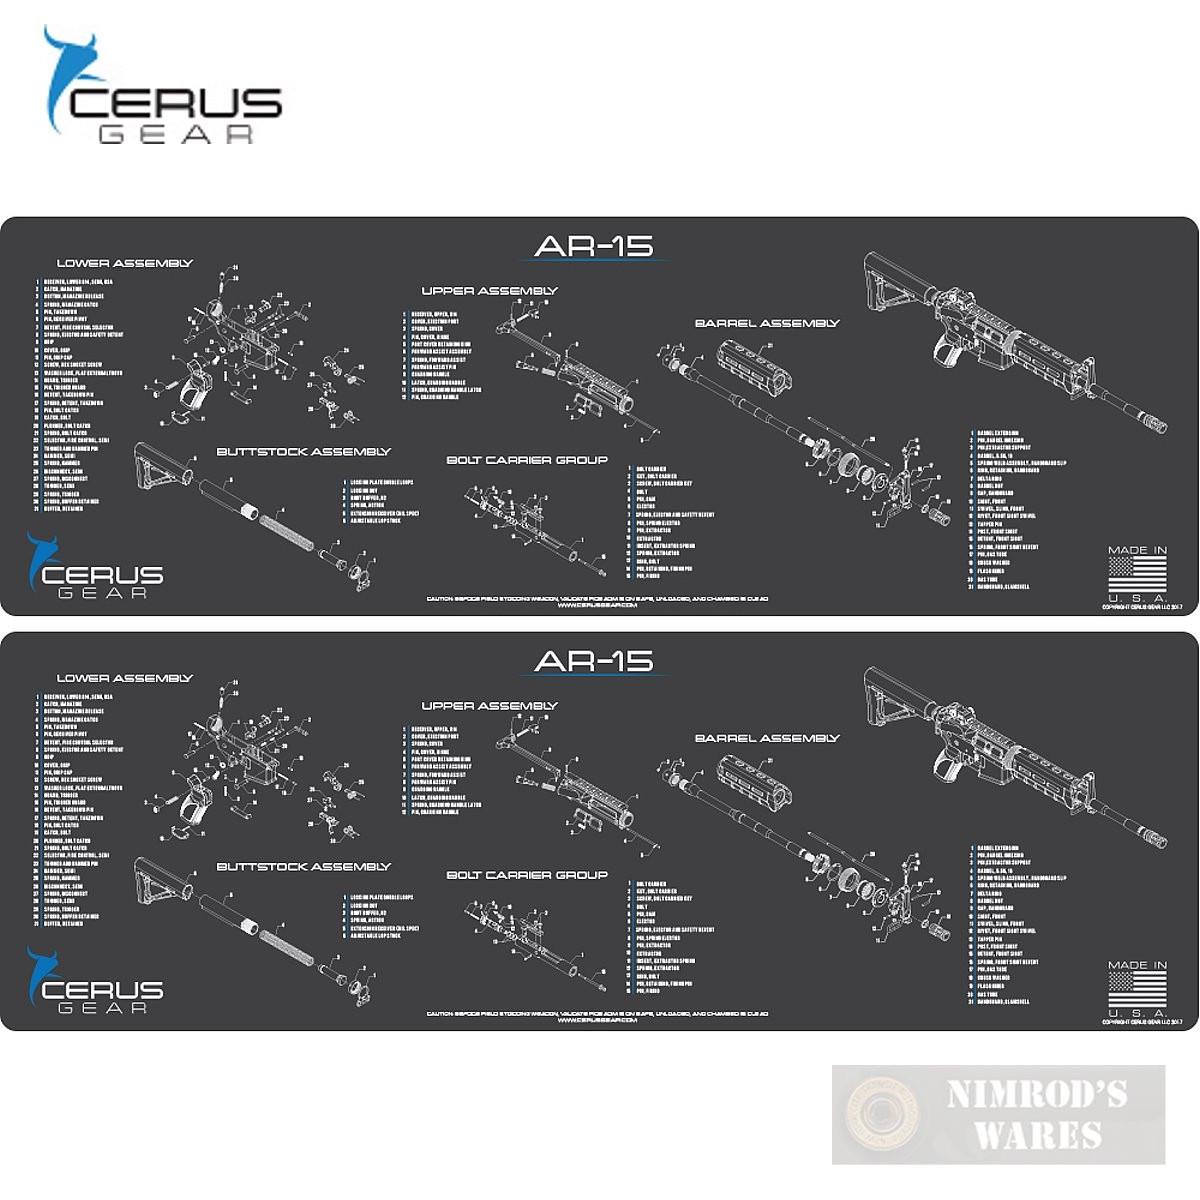 Cerus Gear AR15 Schematic ProMAT Bench MAT 2-PACK 12